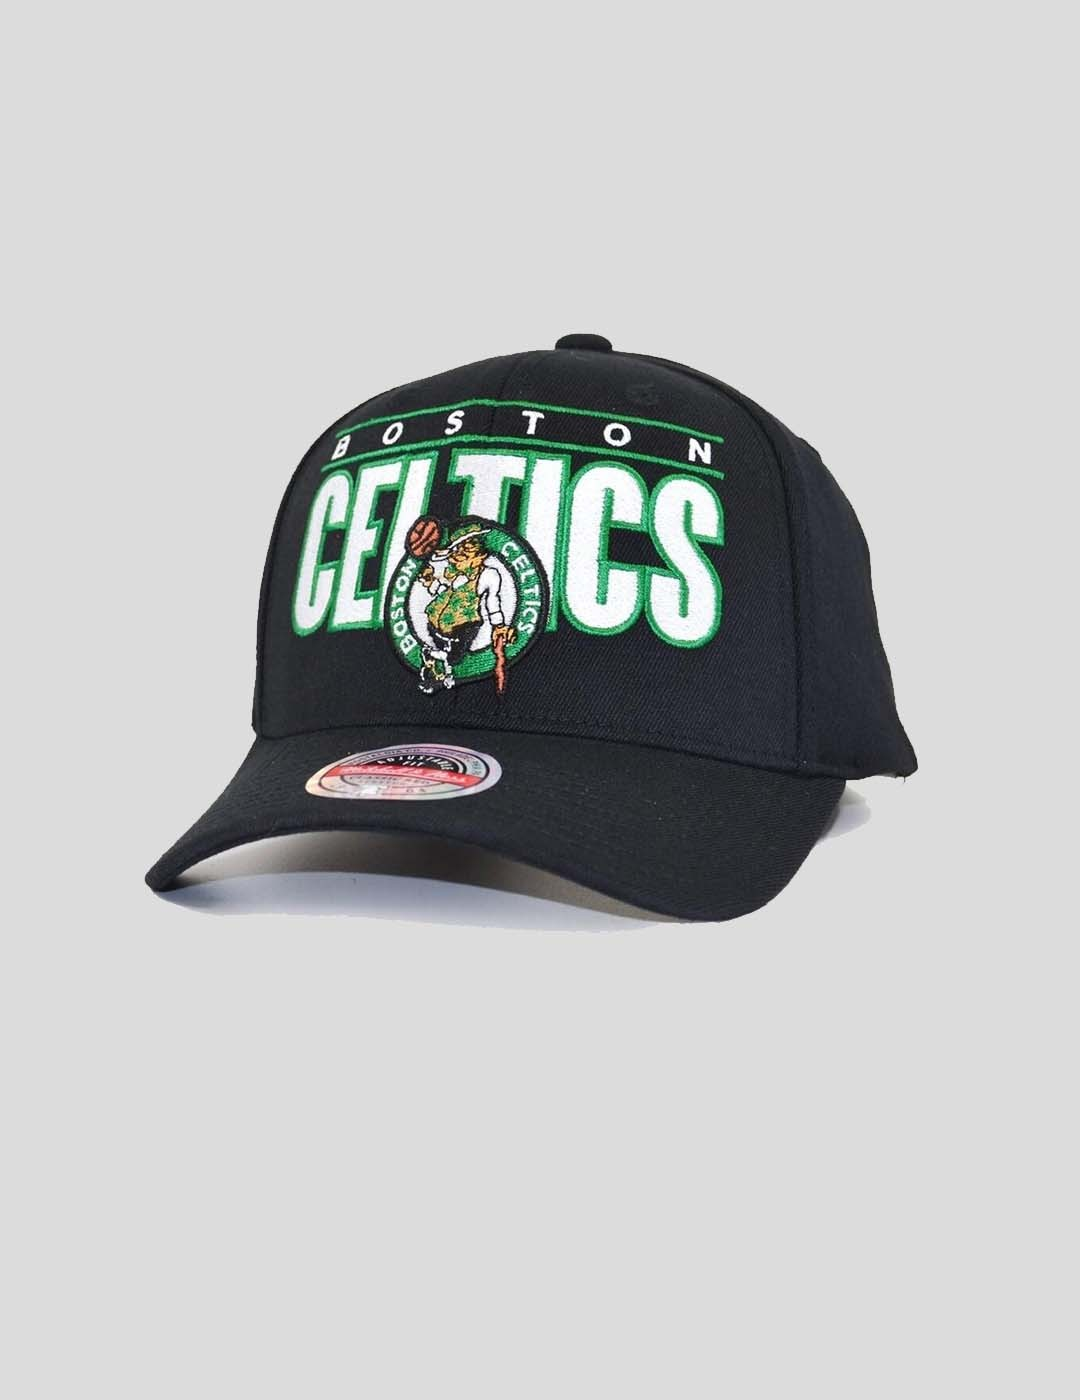 GORRA MITCHELL & NESS NBA BILLBOARD REDLINE BOSTON CELTICS BLACK